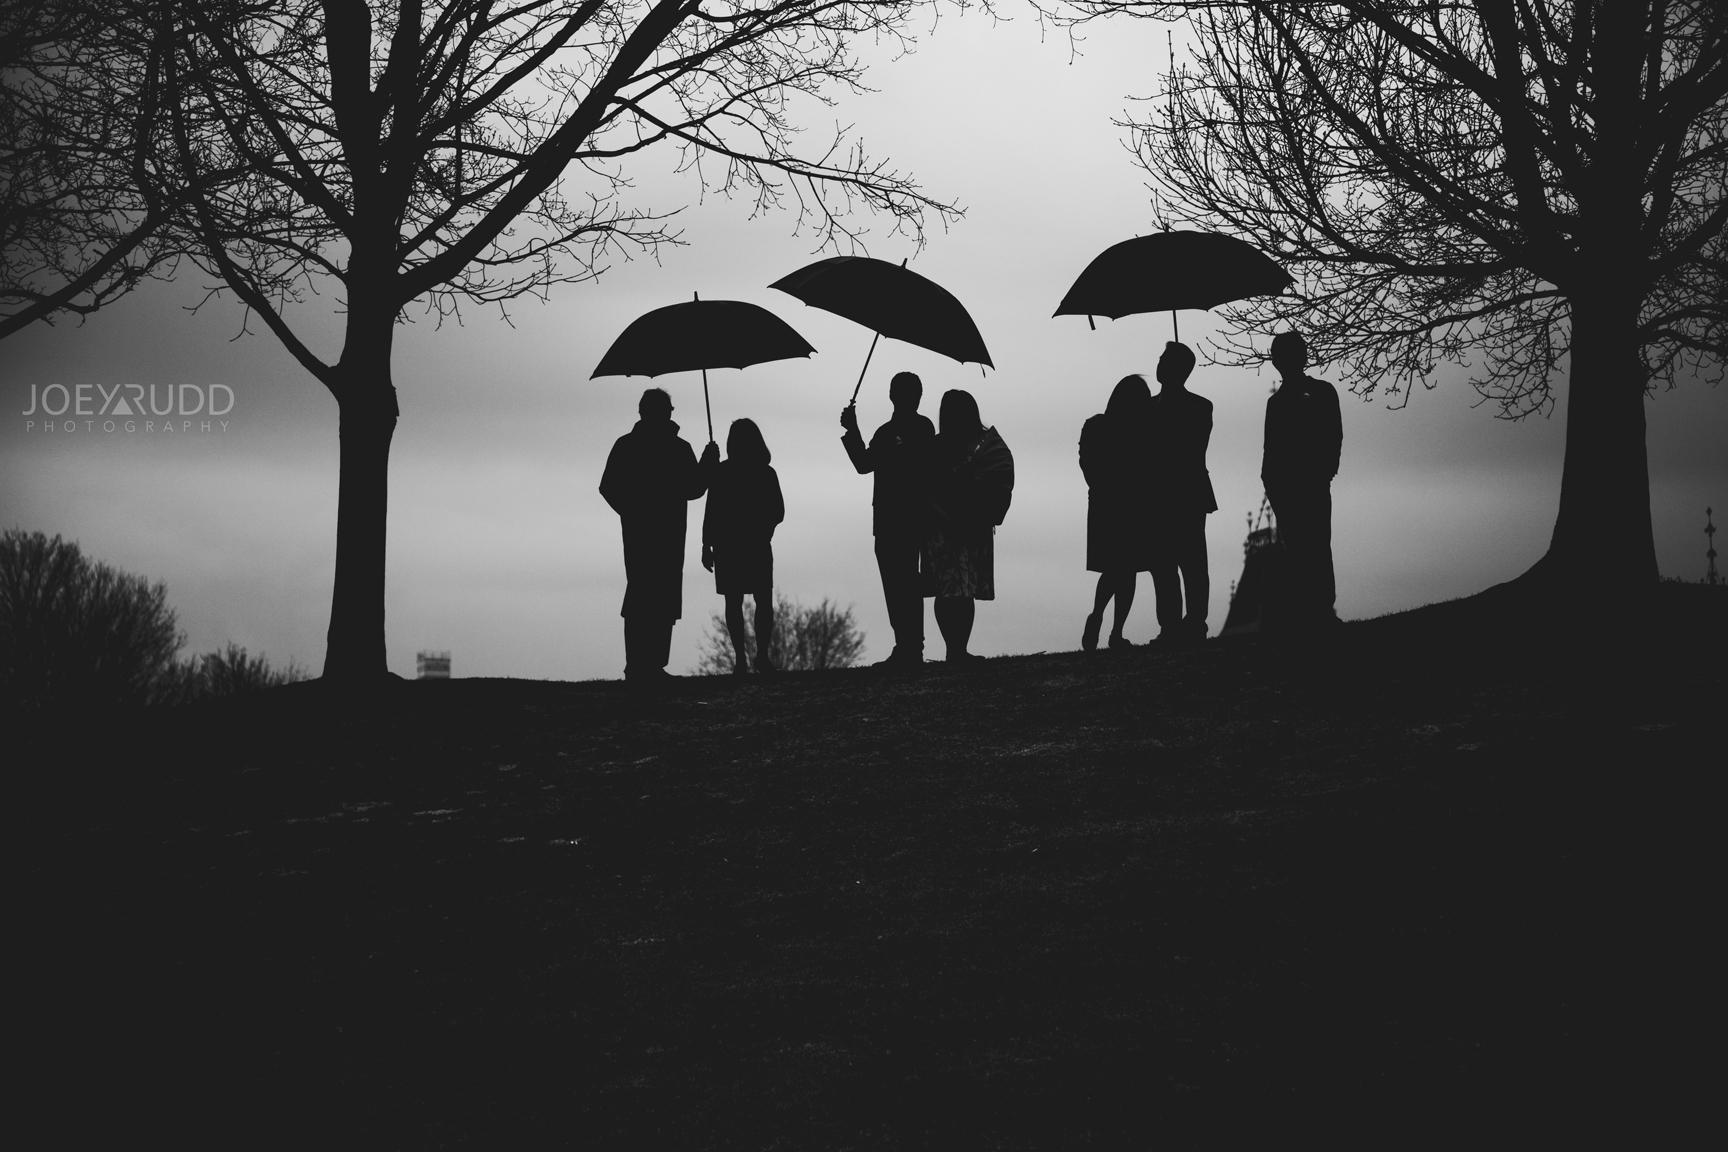 Ottawa Elopement Wedding Photographer Joey Rudd Photography Family Umbrellas